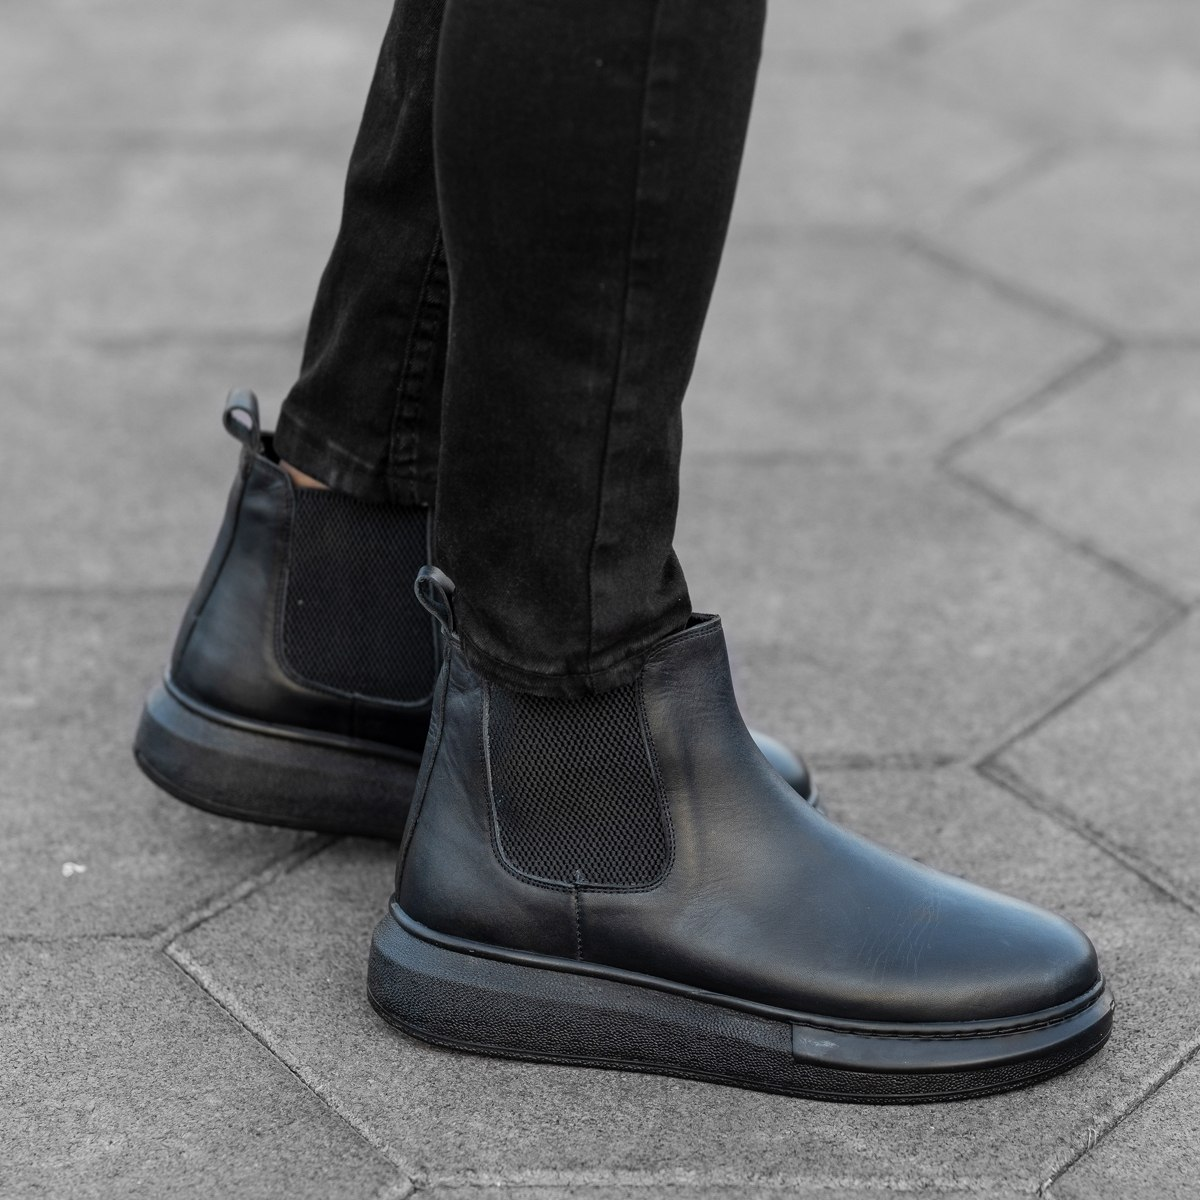 Genuine-Leather Hype Sole Chelsea Boots In Black Mv Premium Brand - 1